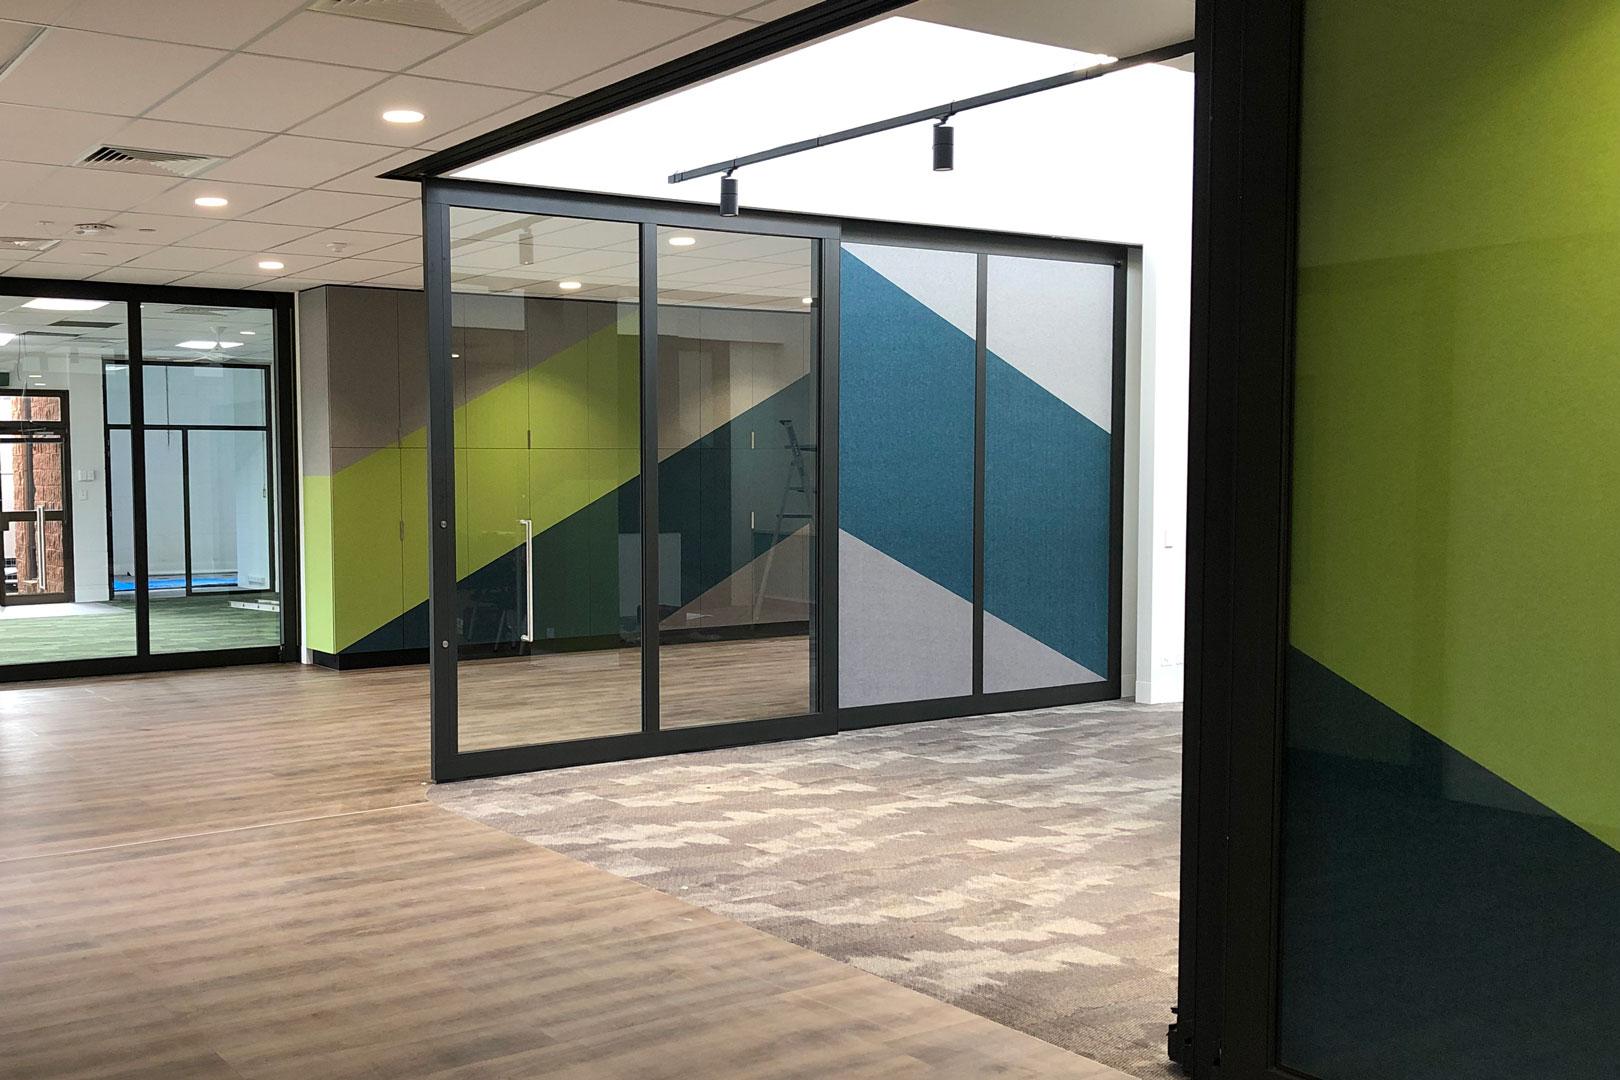 acoustic sliding doors in a primary school